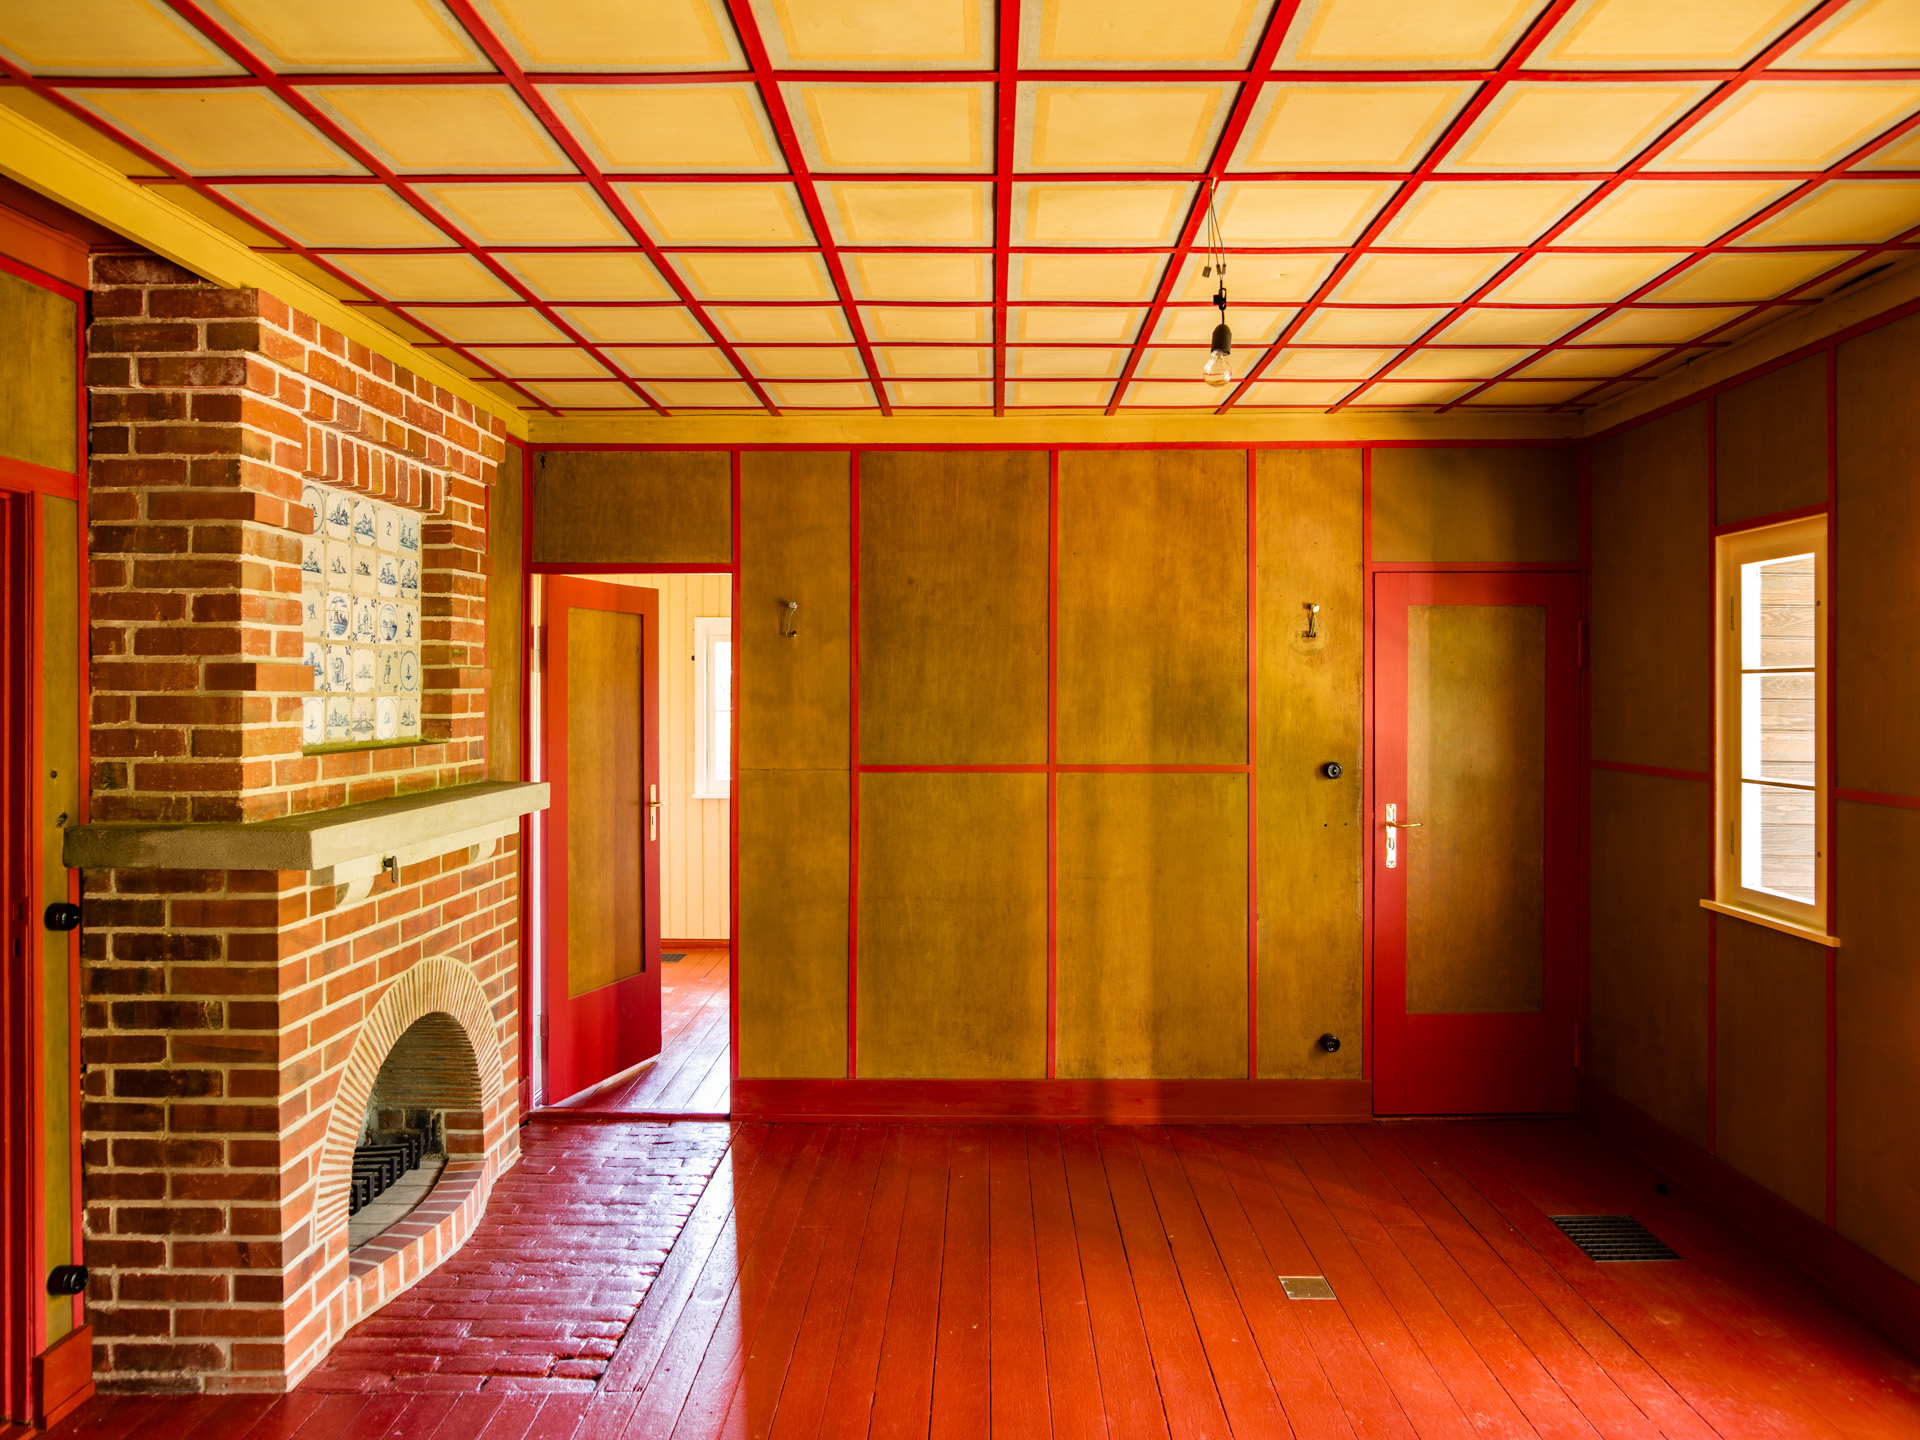 Alexander Haus living room comparison 2019 André Wagner.jpg